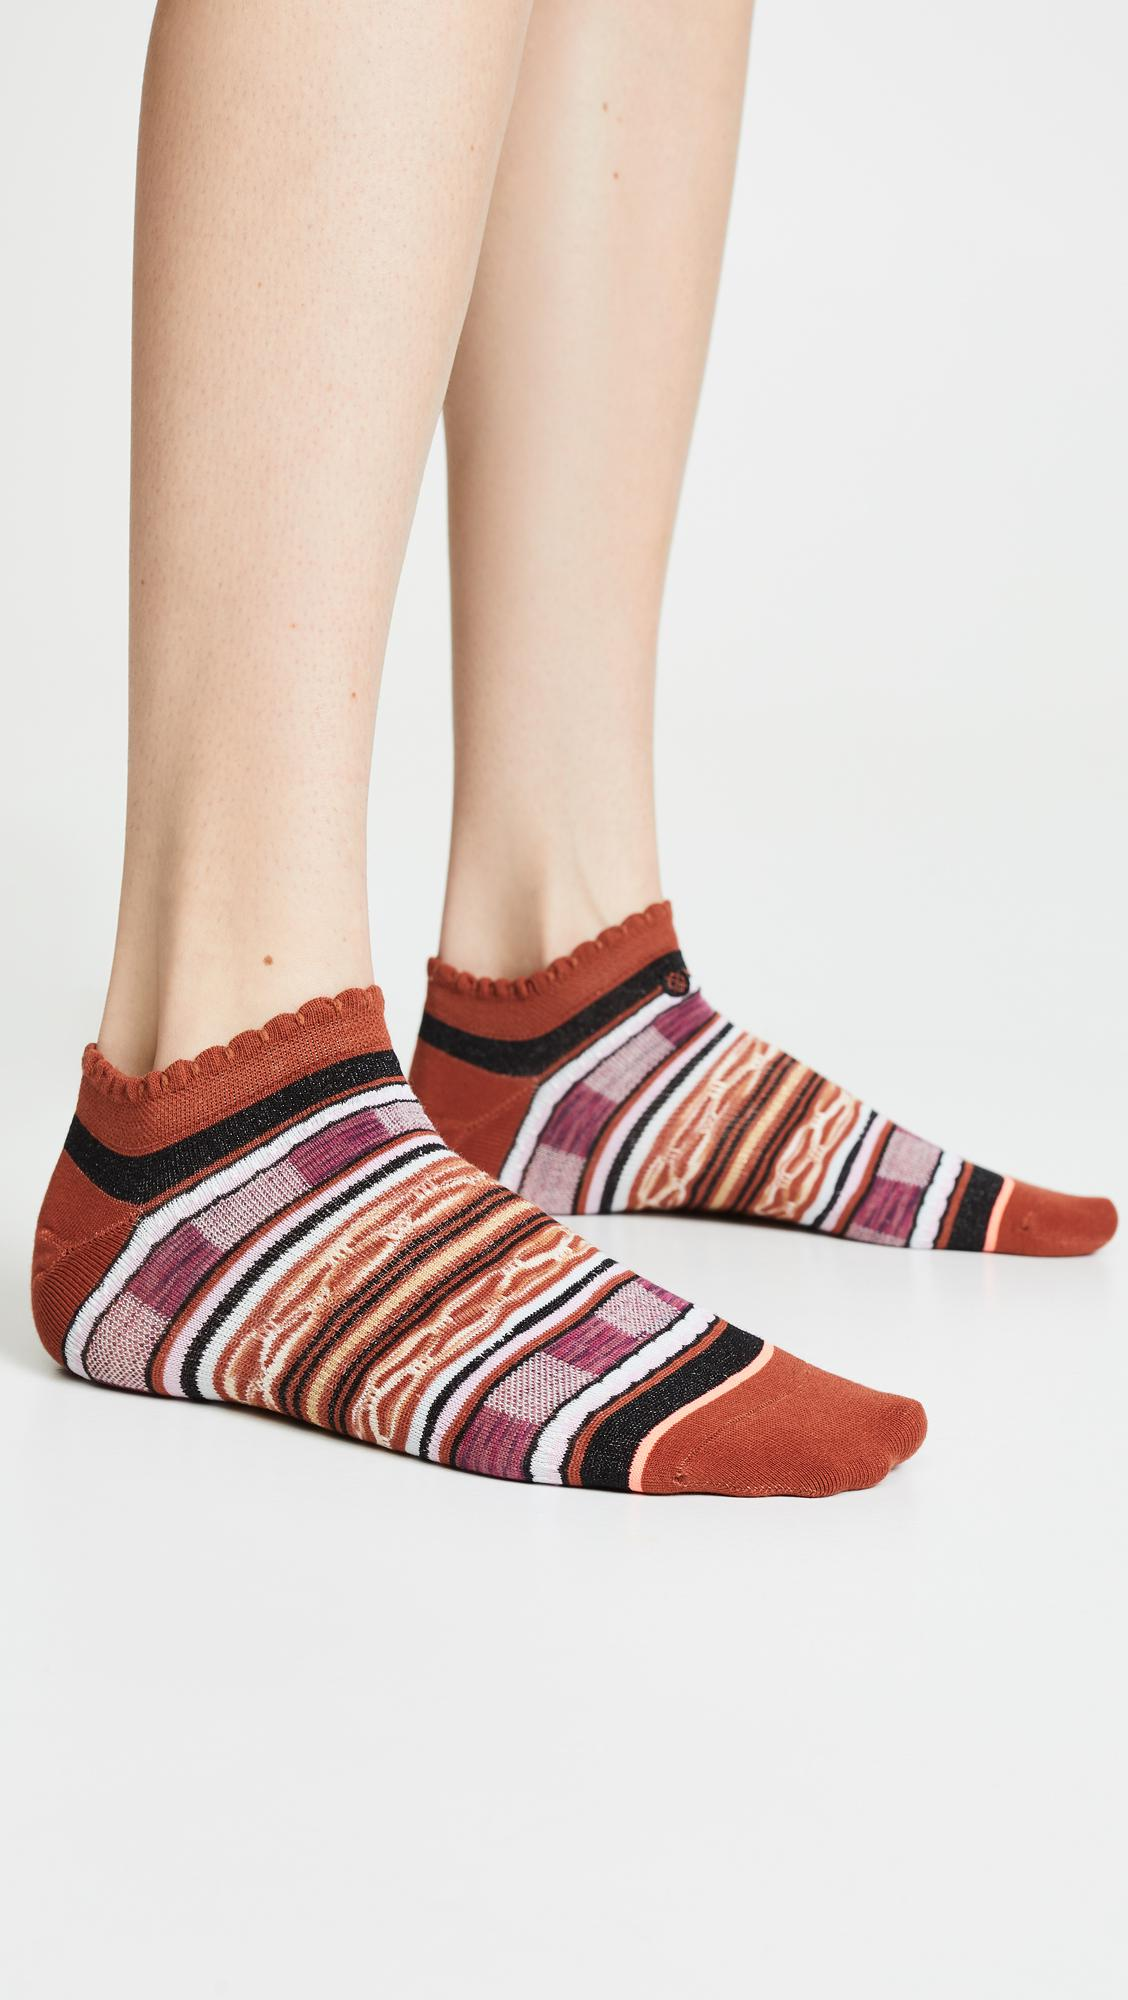 Lyst - Stance Terraform Socks